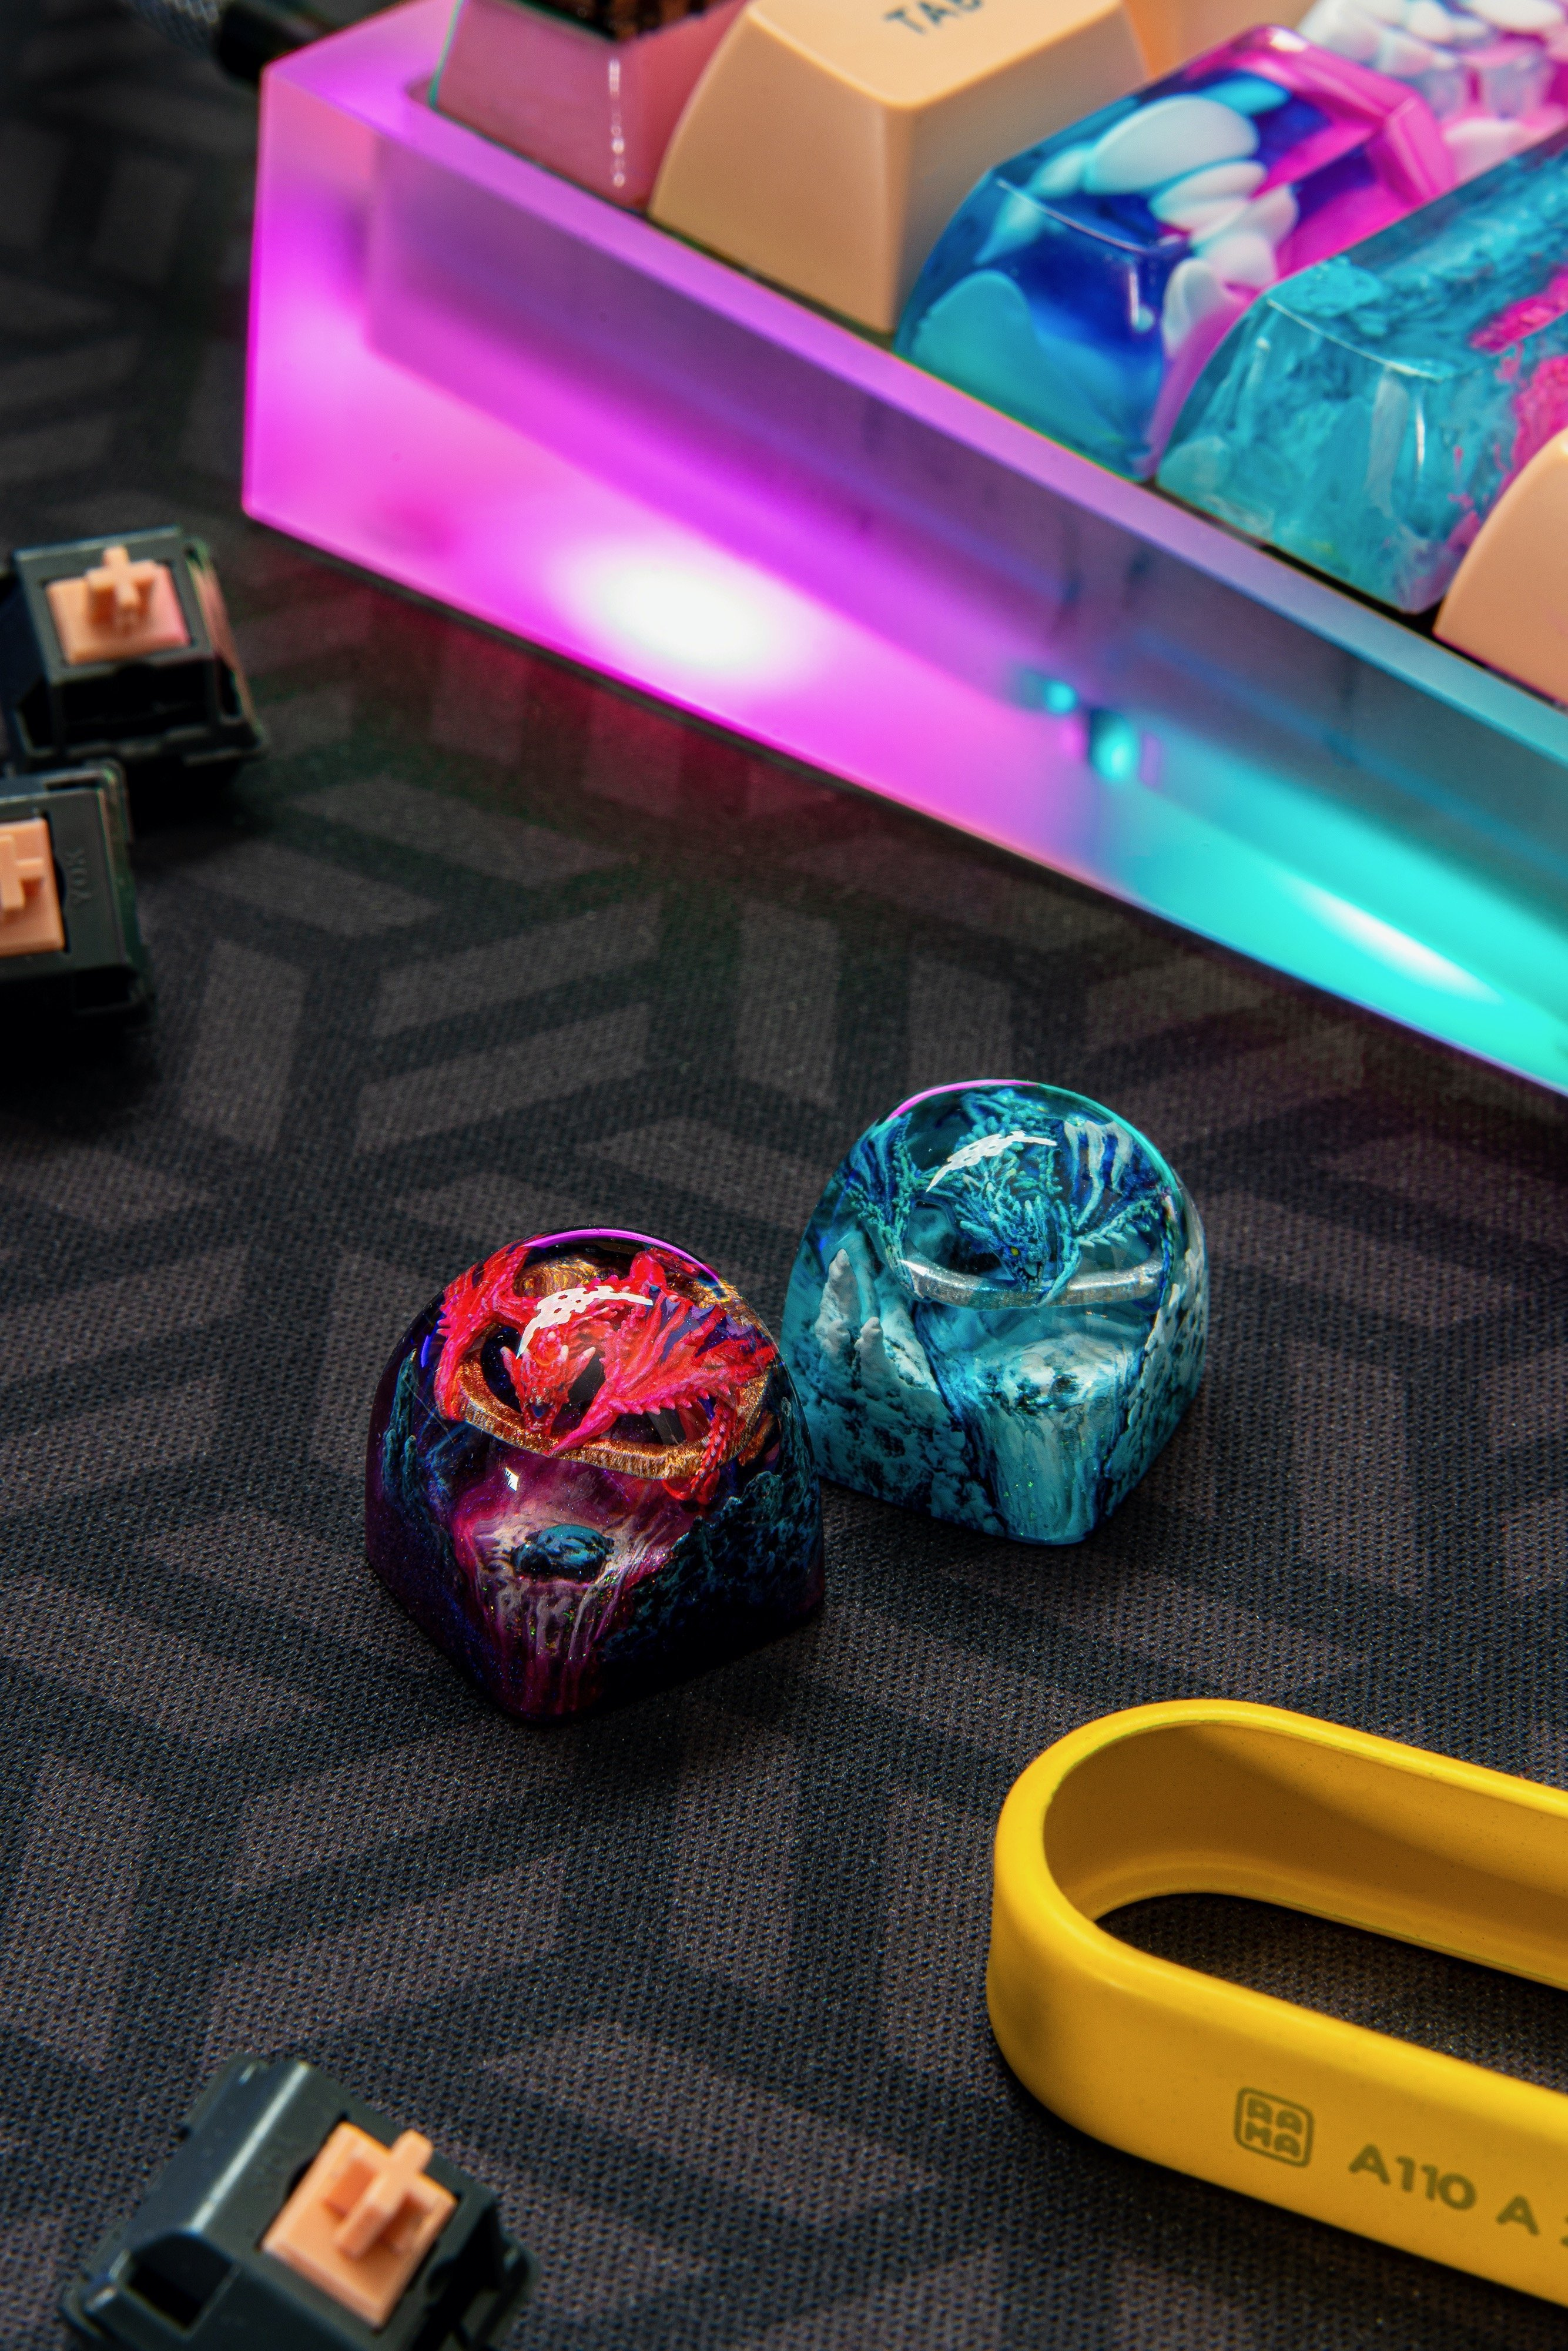 dwarf factory dragon keycaps